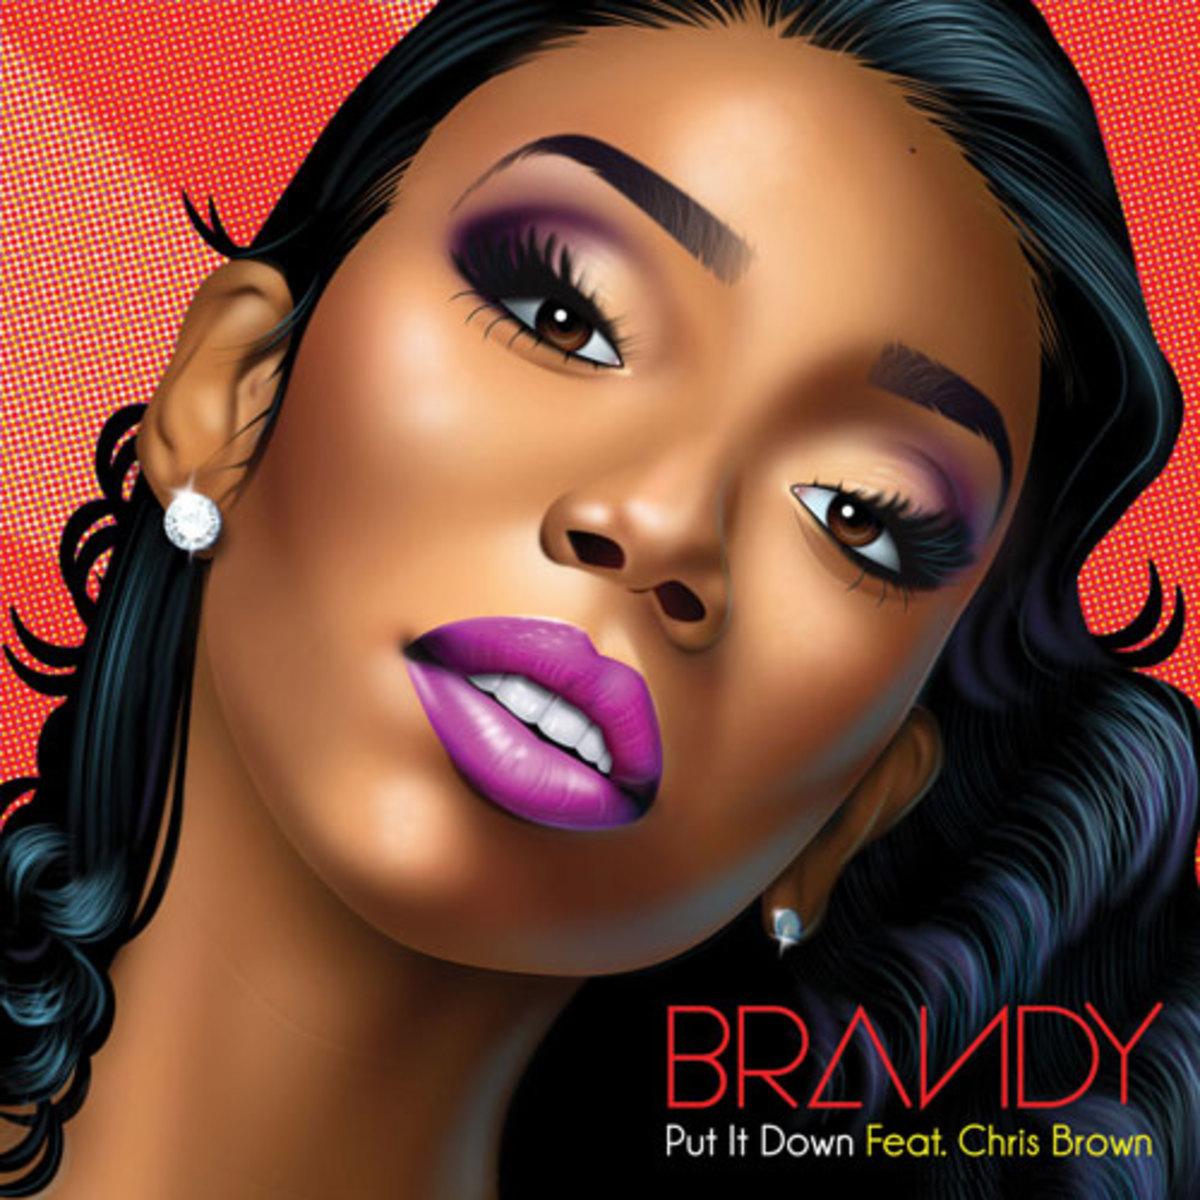 Brandy Ft. Chris Brown - Put It Down mp3 download